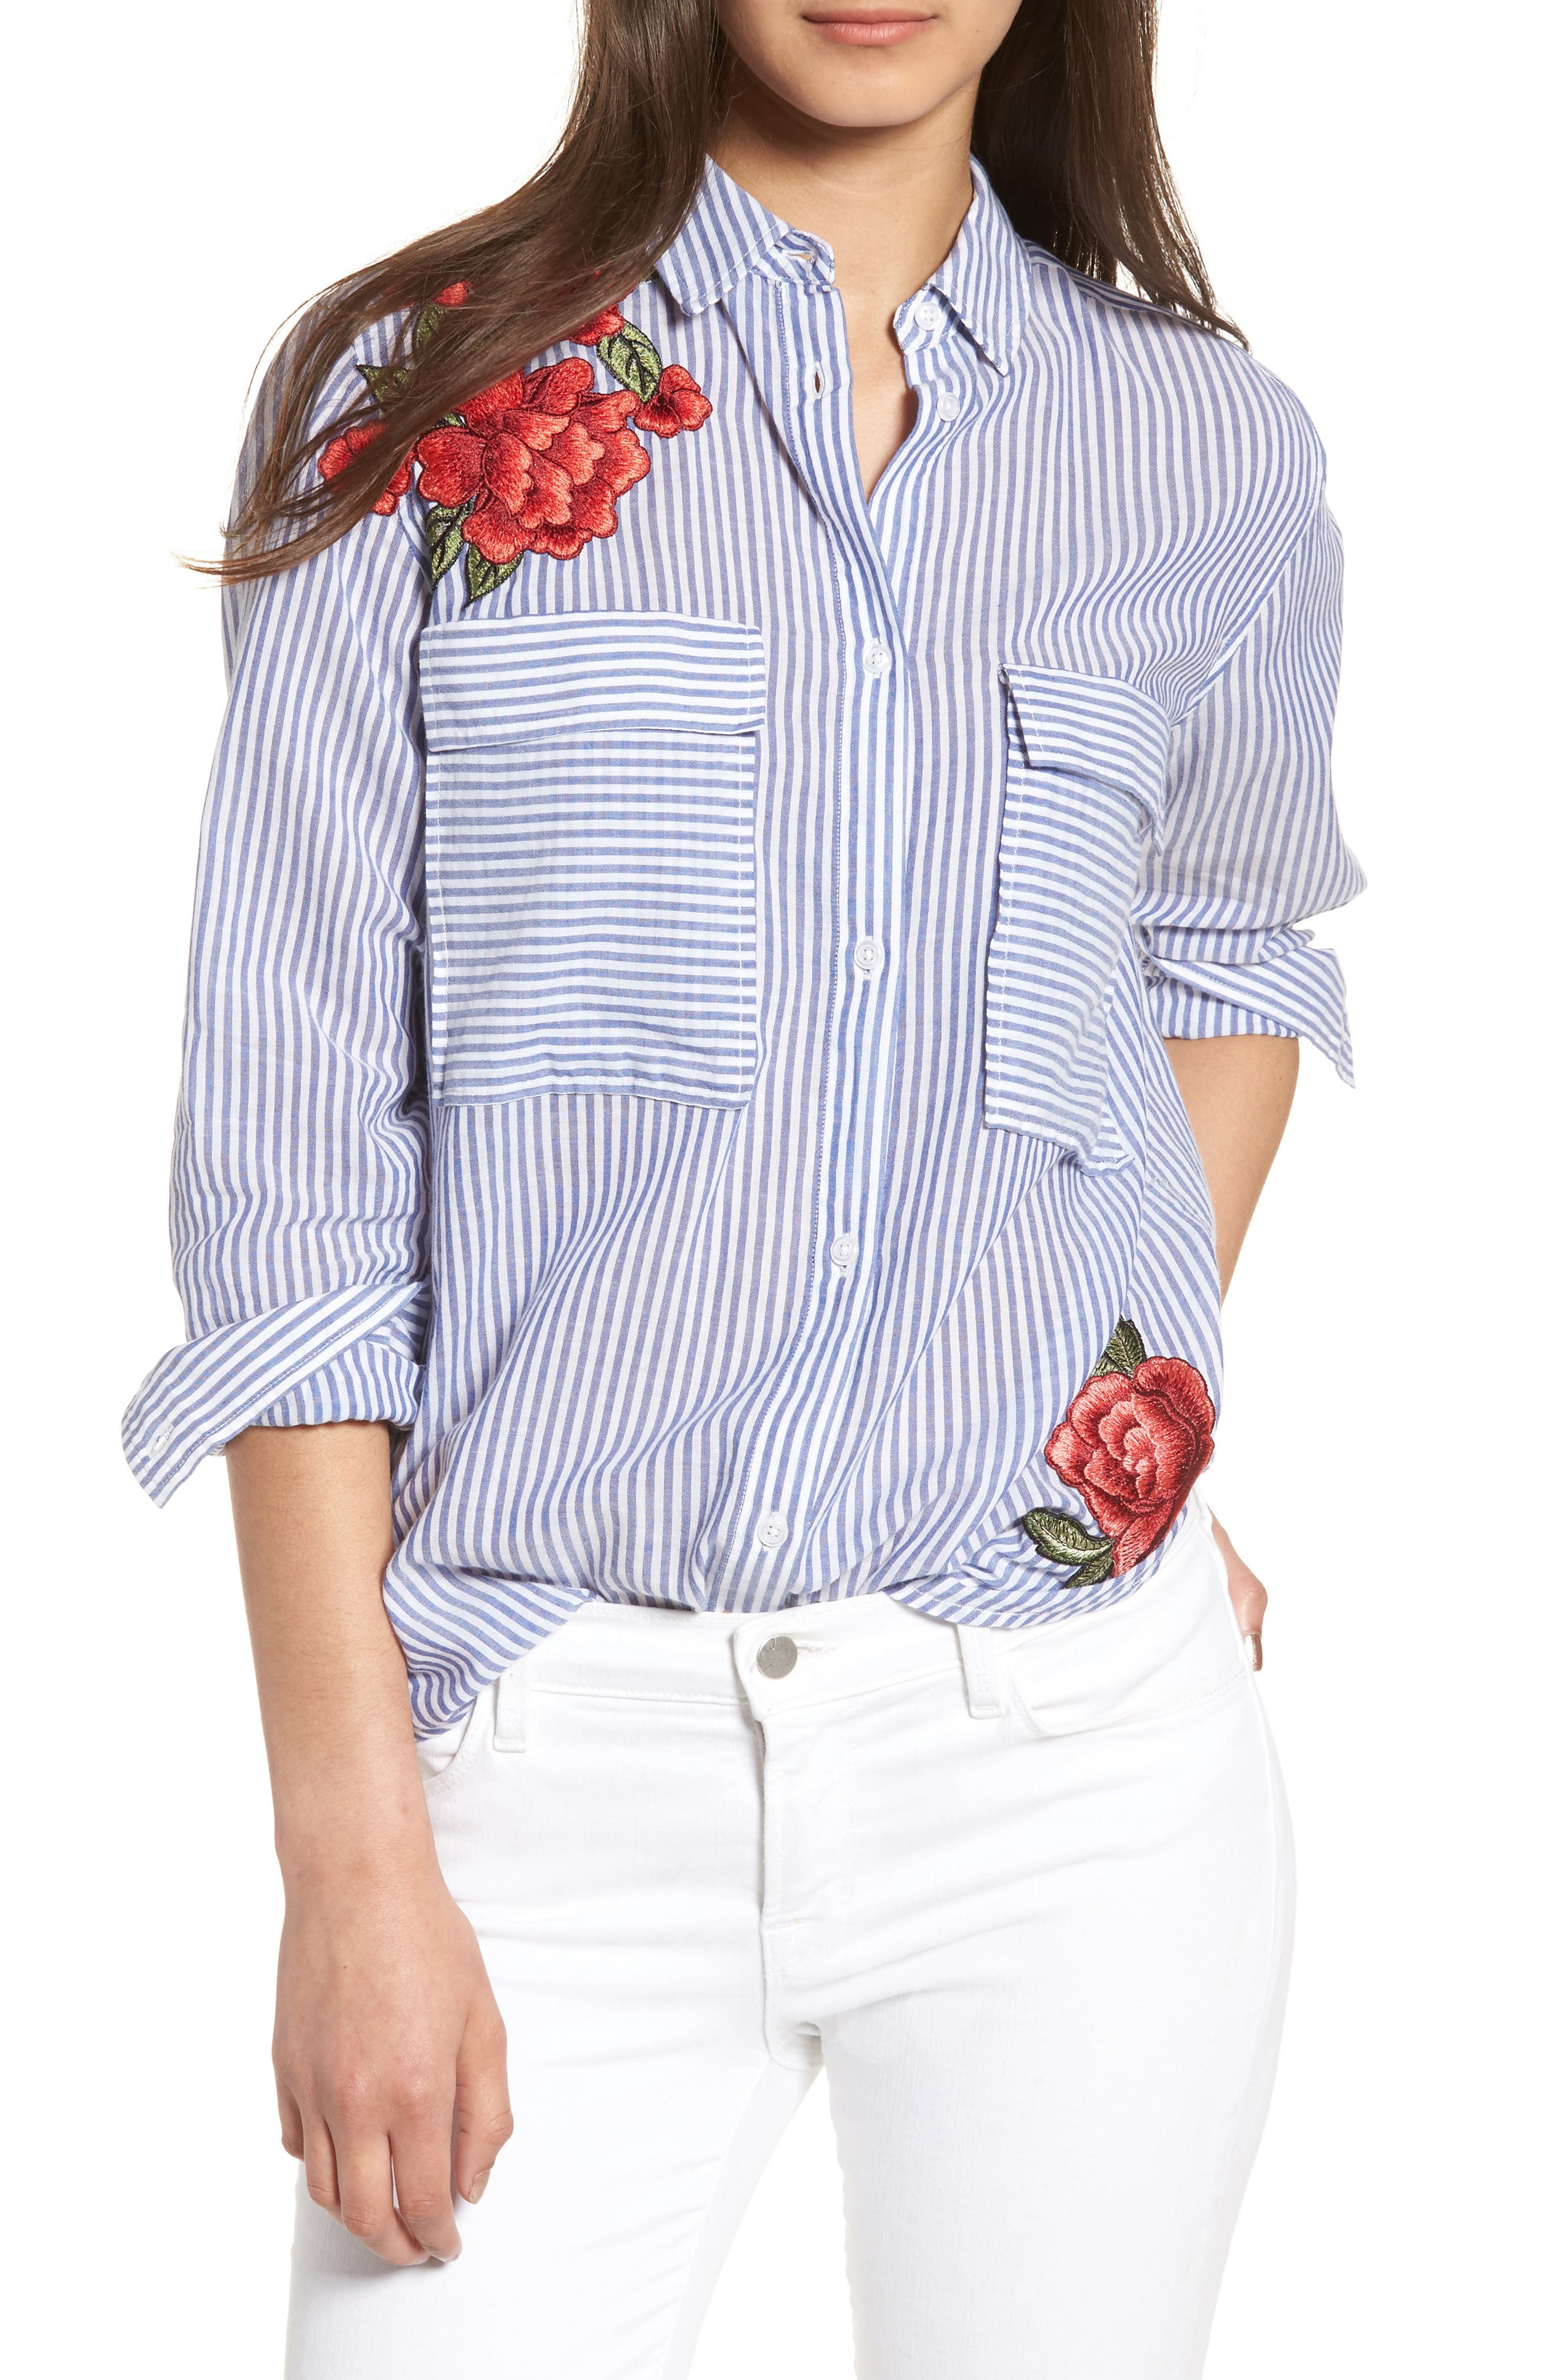 Alternate Image 1 Selected - Rails Frances Embroidered Stripe Shirt